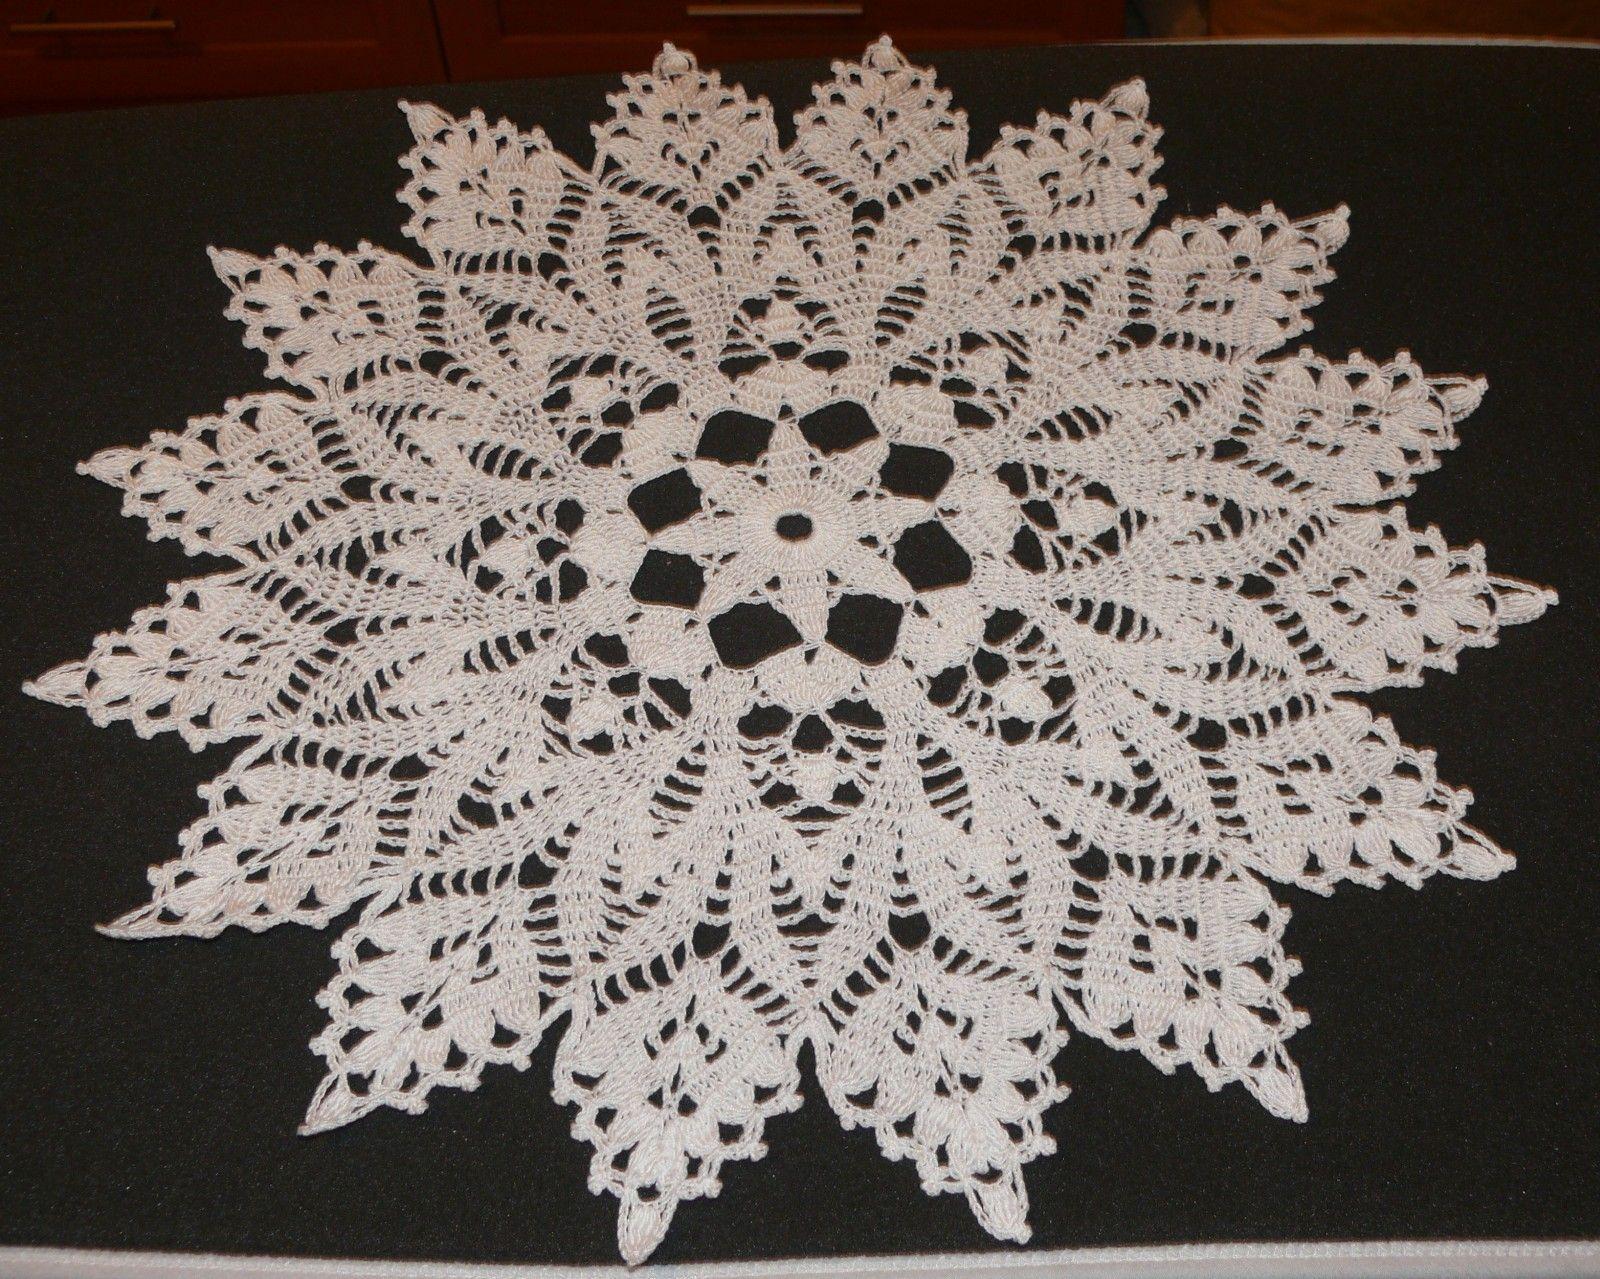 Galerija - Lianos Galerija | Tapetes crochet | Pinterest | Carpeta y ...